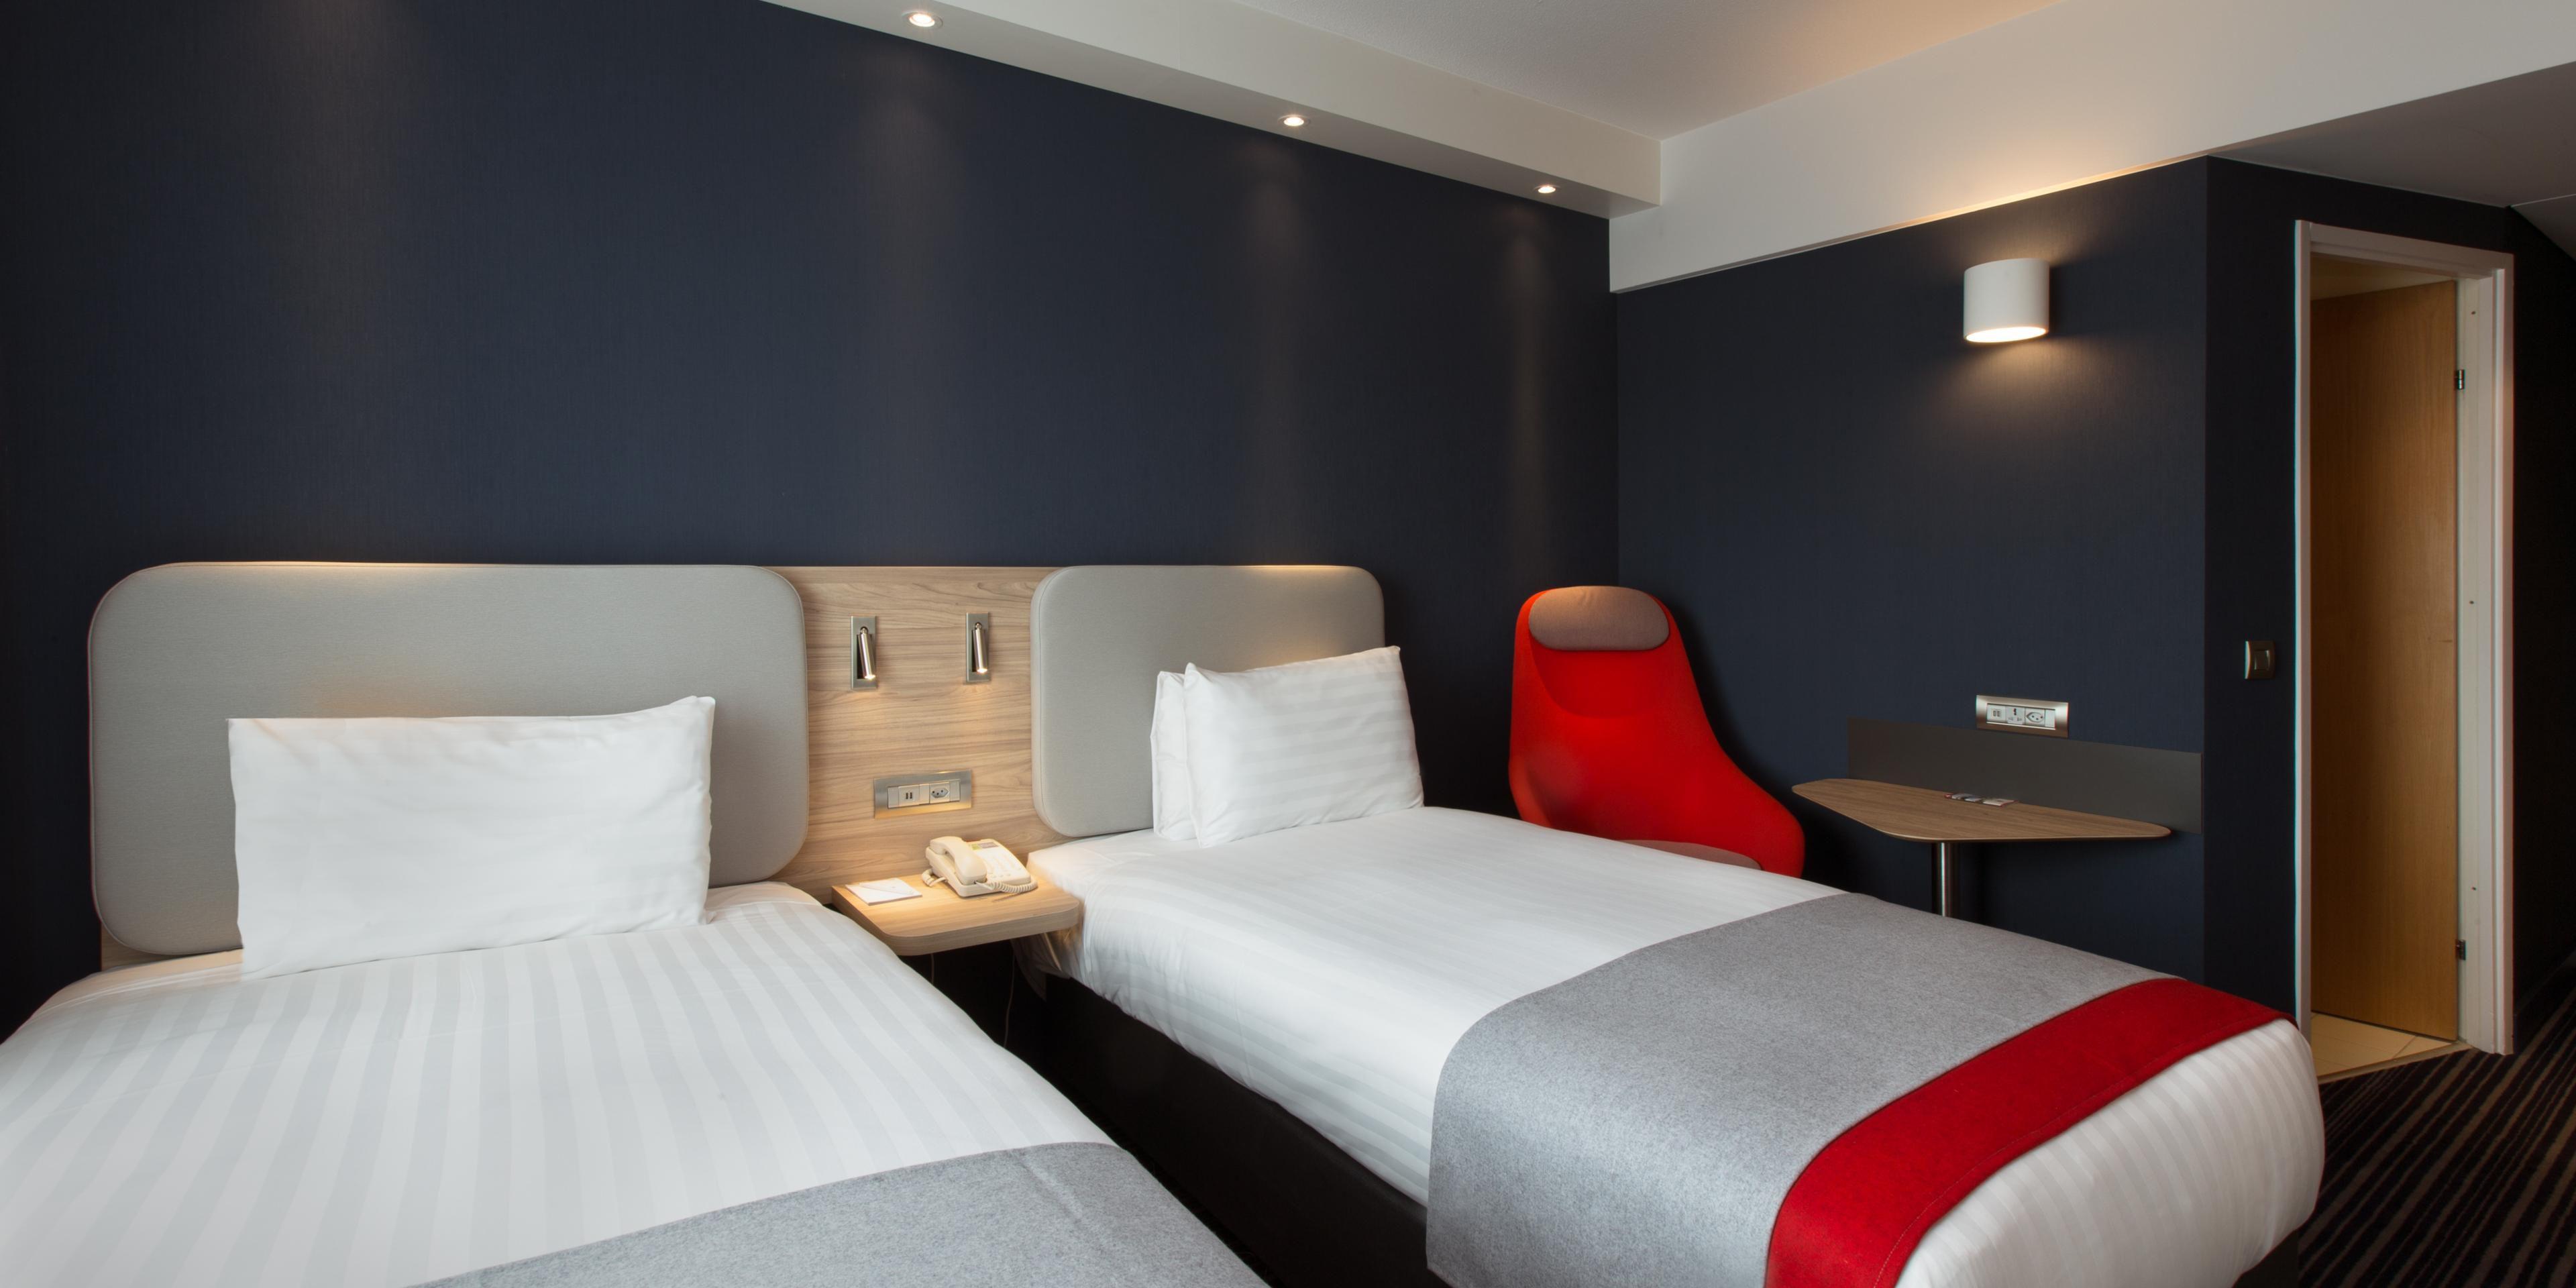 Holiday Inn Express Geneva Airport Hotel by IHG